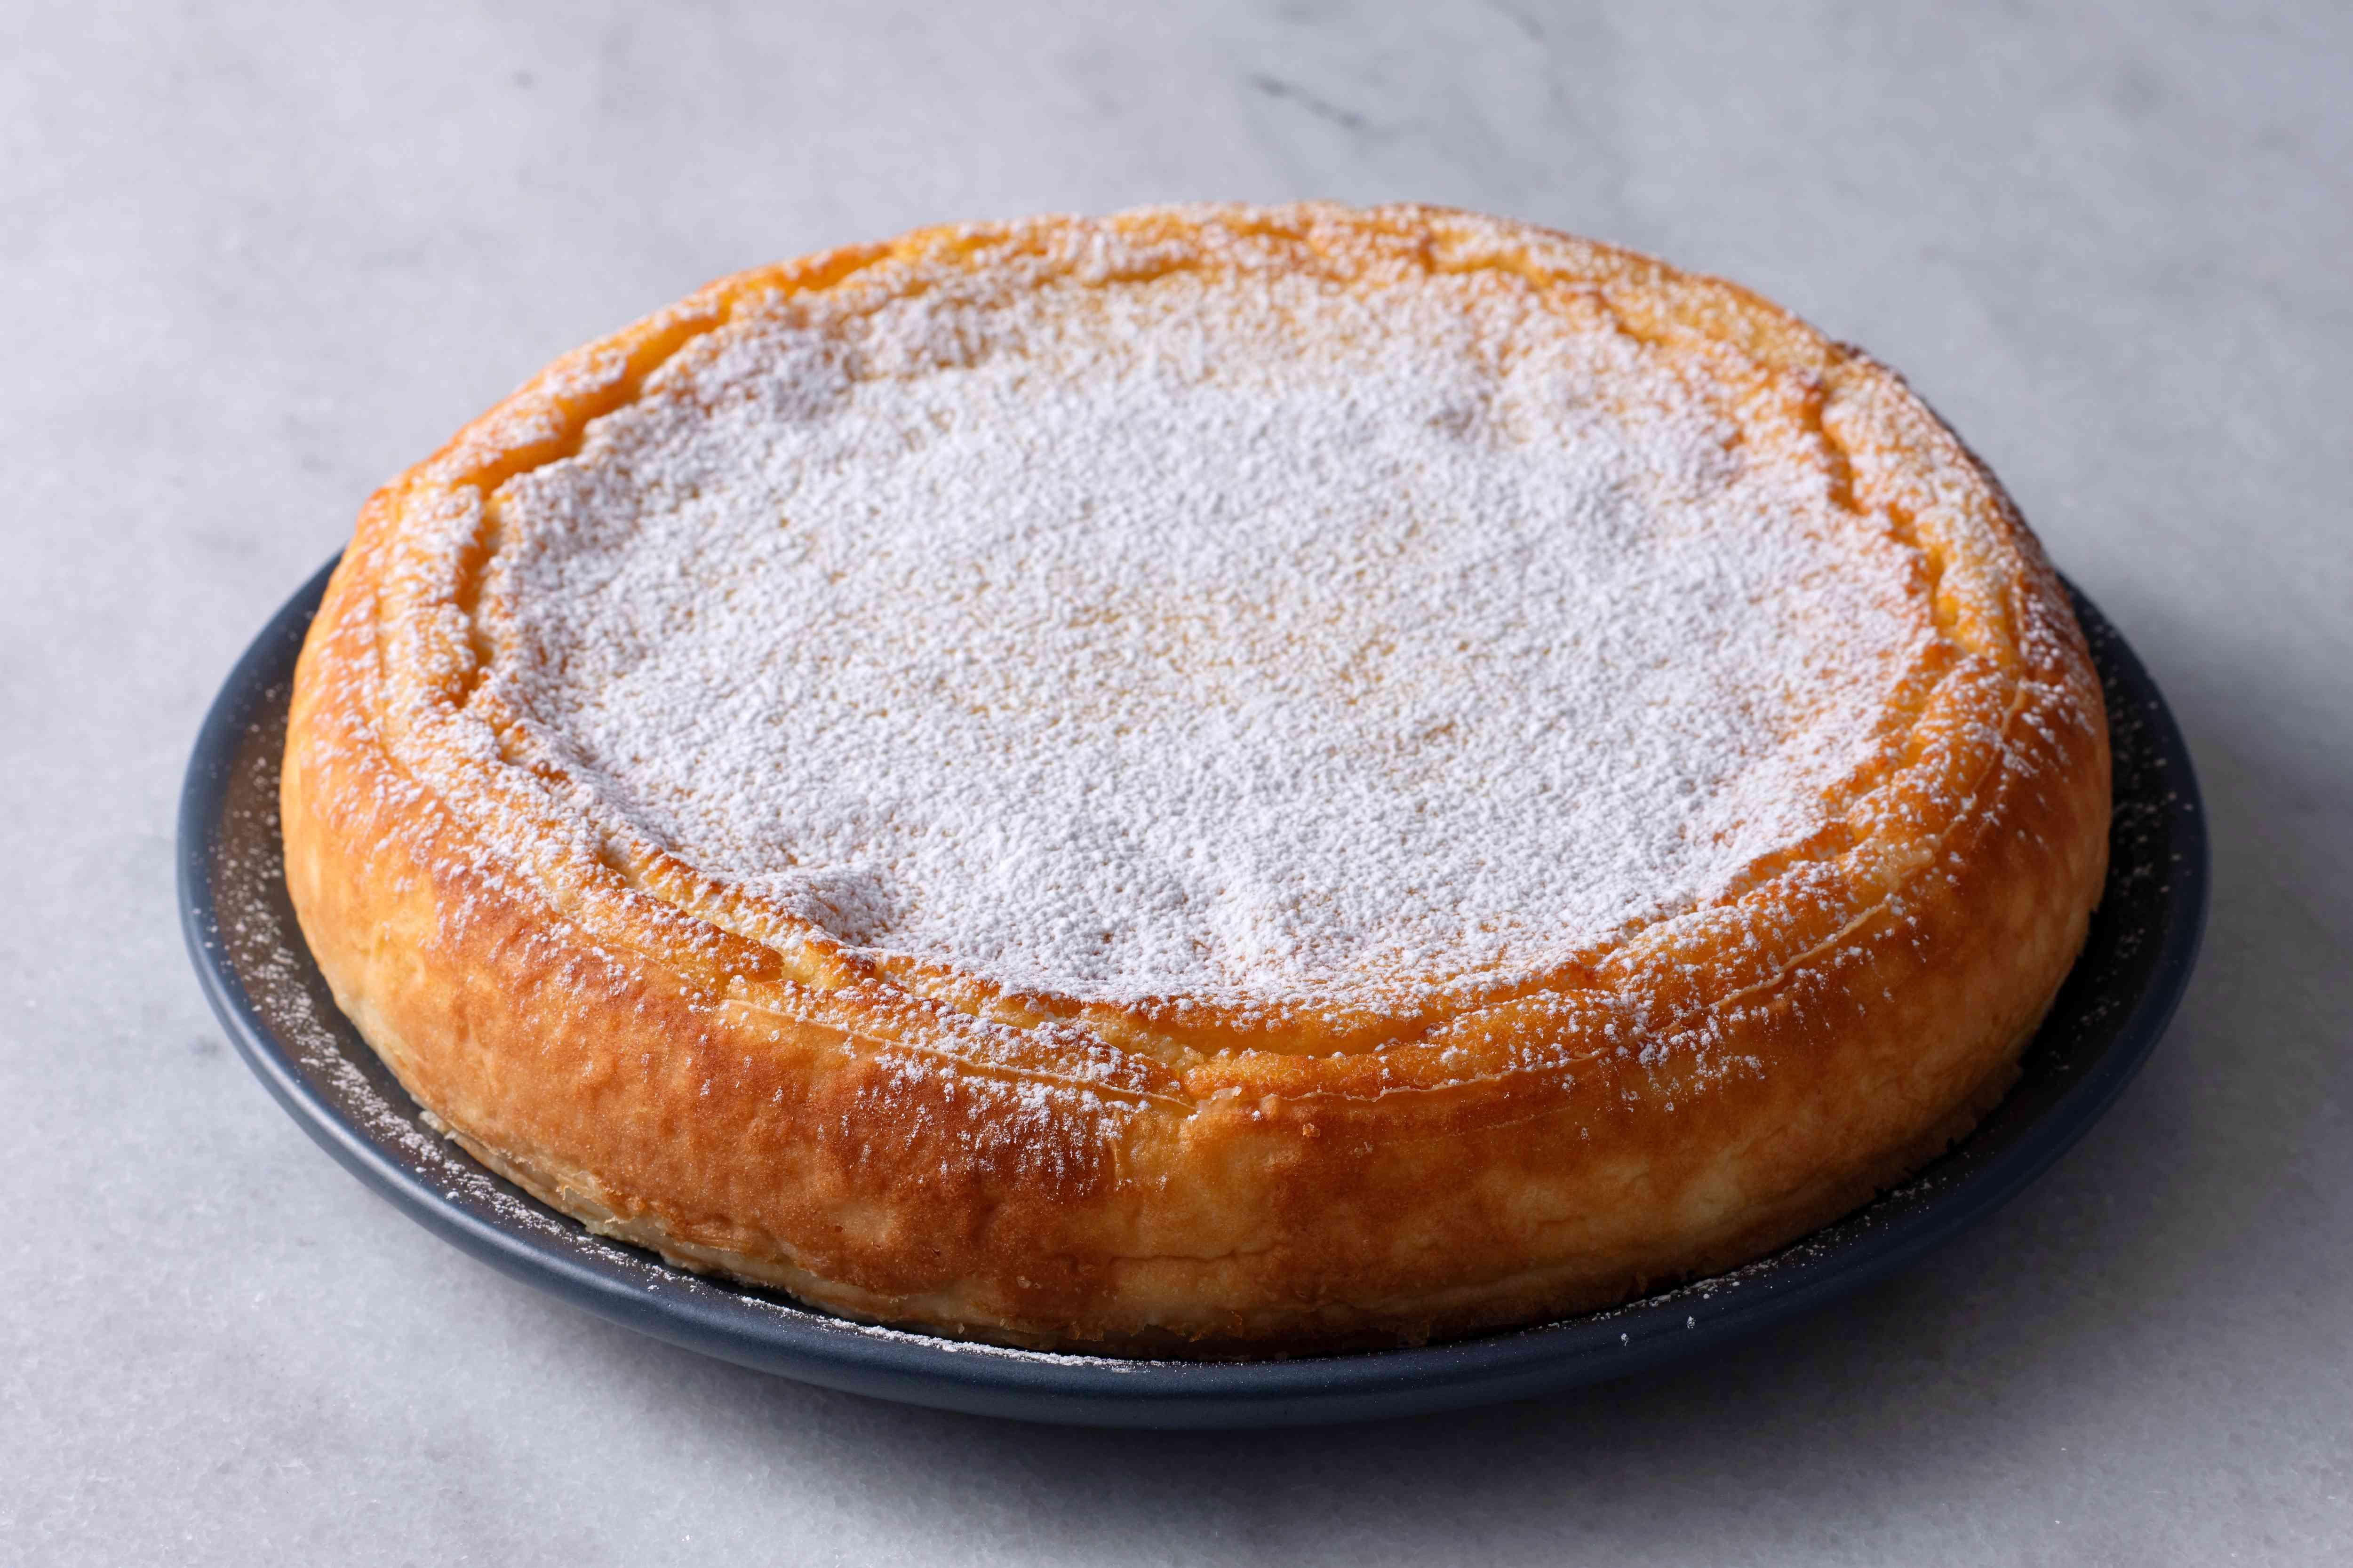 Naples-Style Lemon Ricotta Cake (Migliaccio)